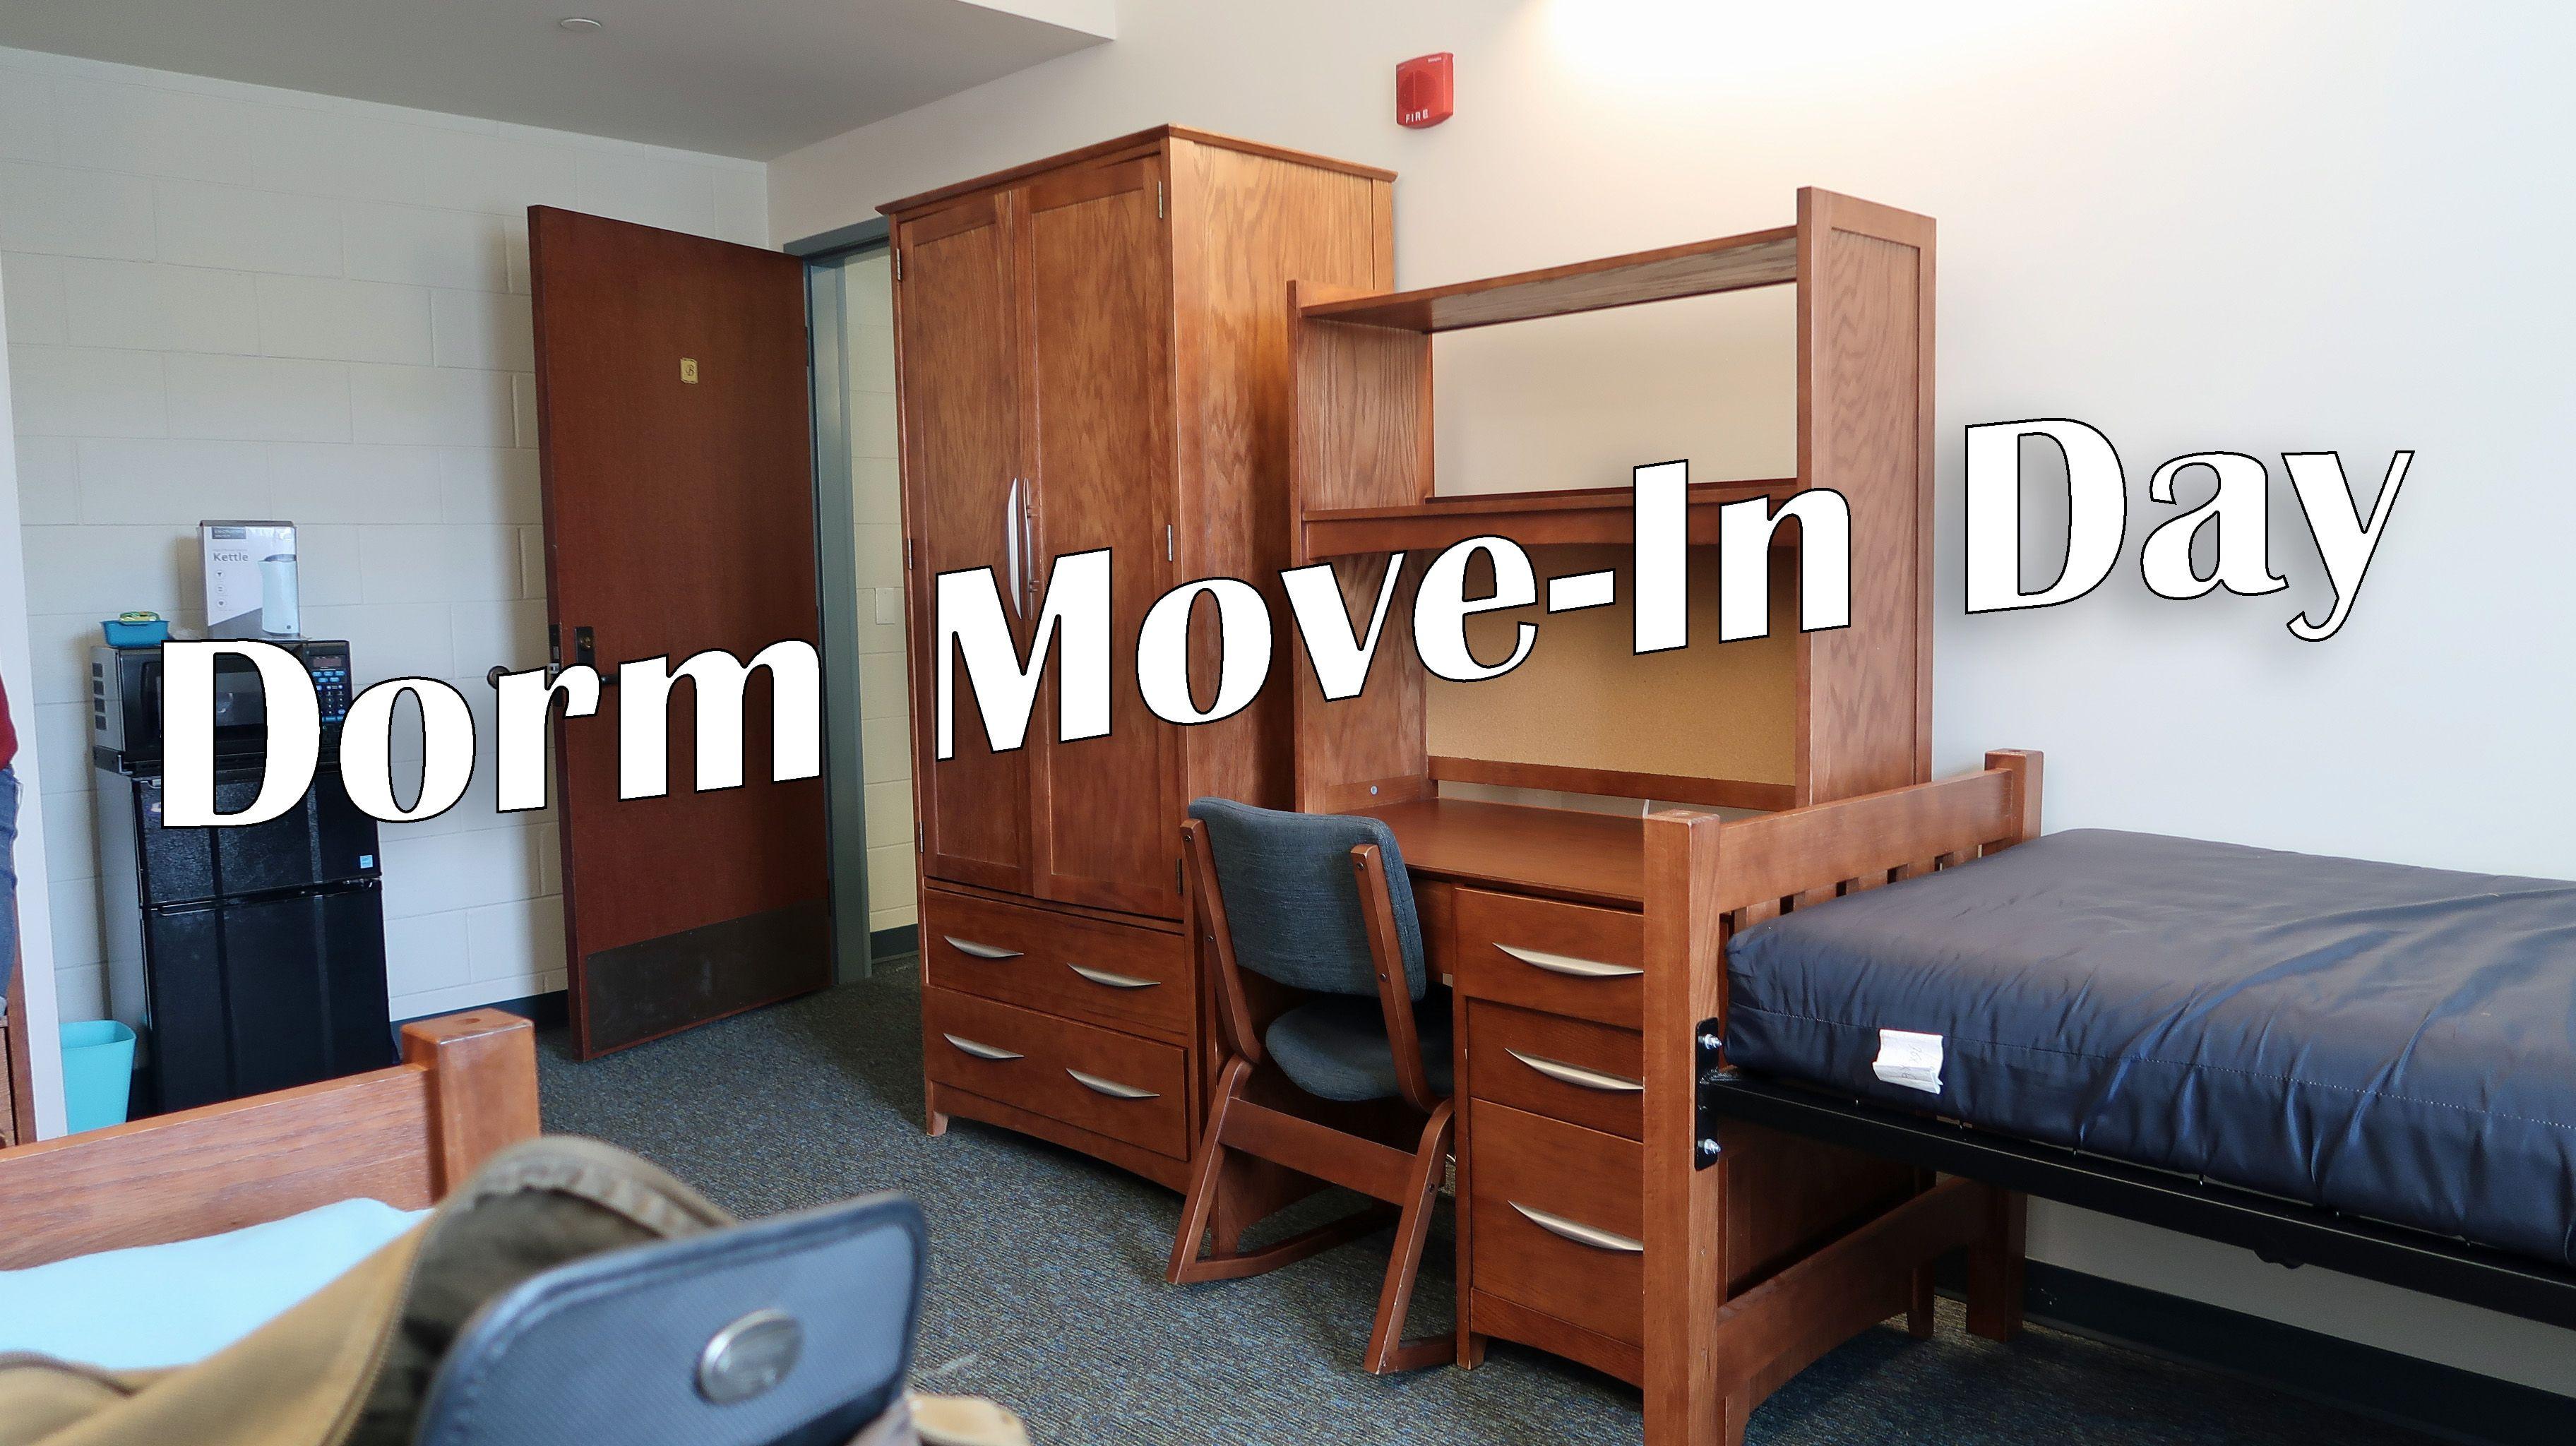 Cnu Christopher Newport University Dorm Room Lights College Dorm Rooms College Dorm